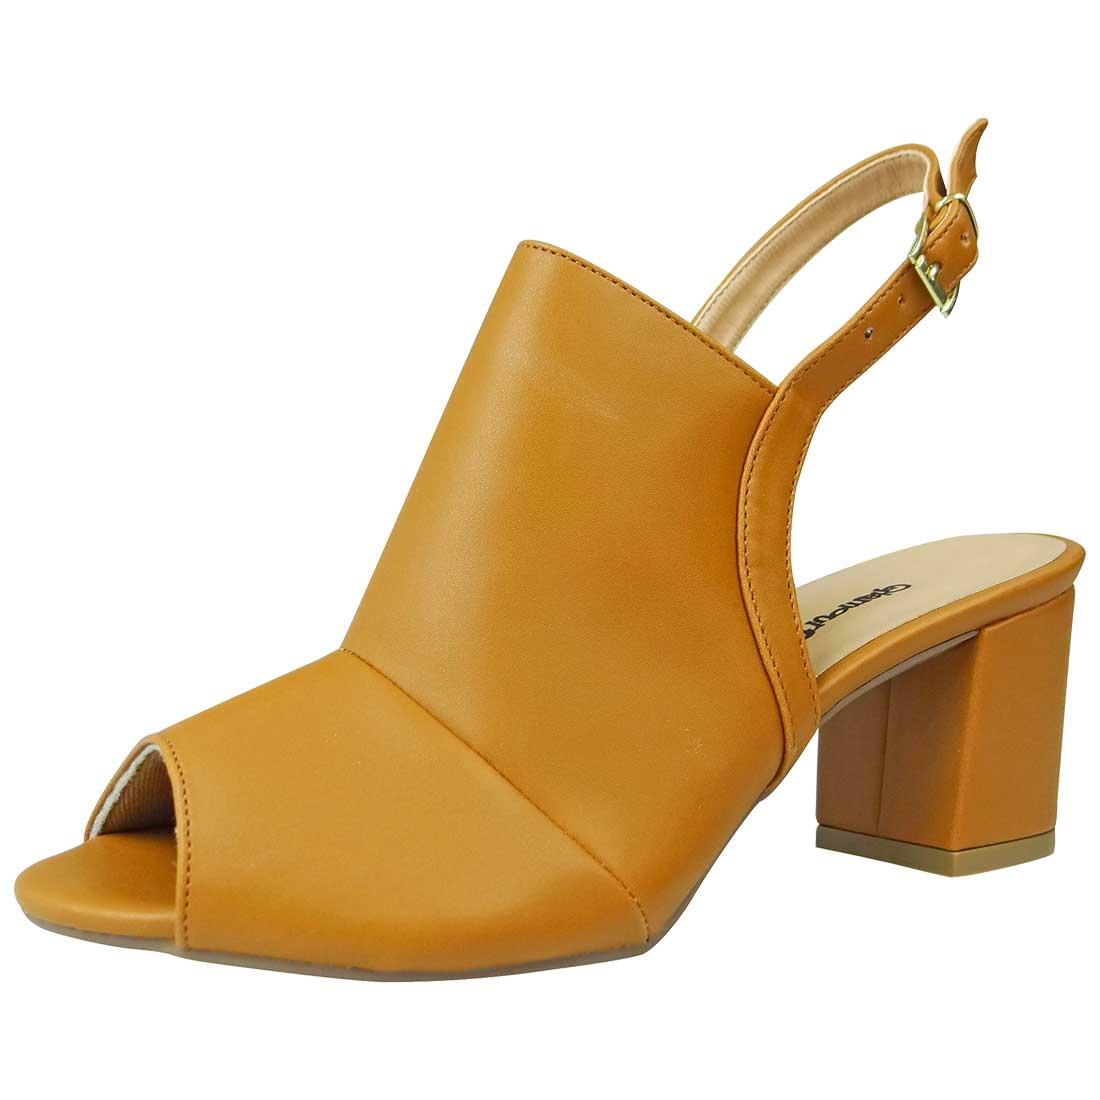 Sandal Boot - Caramelo